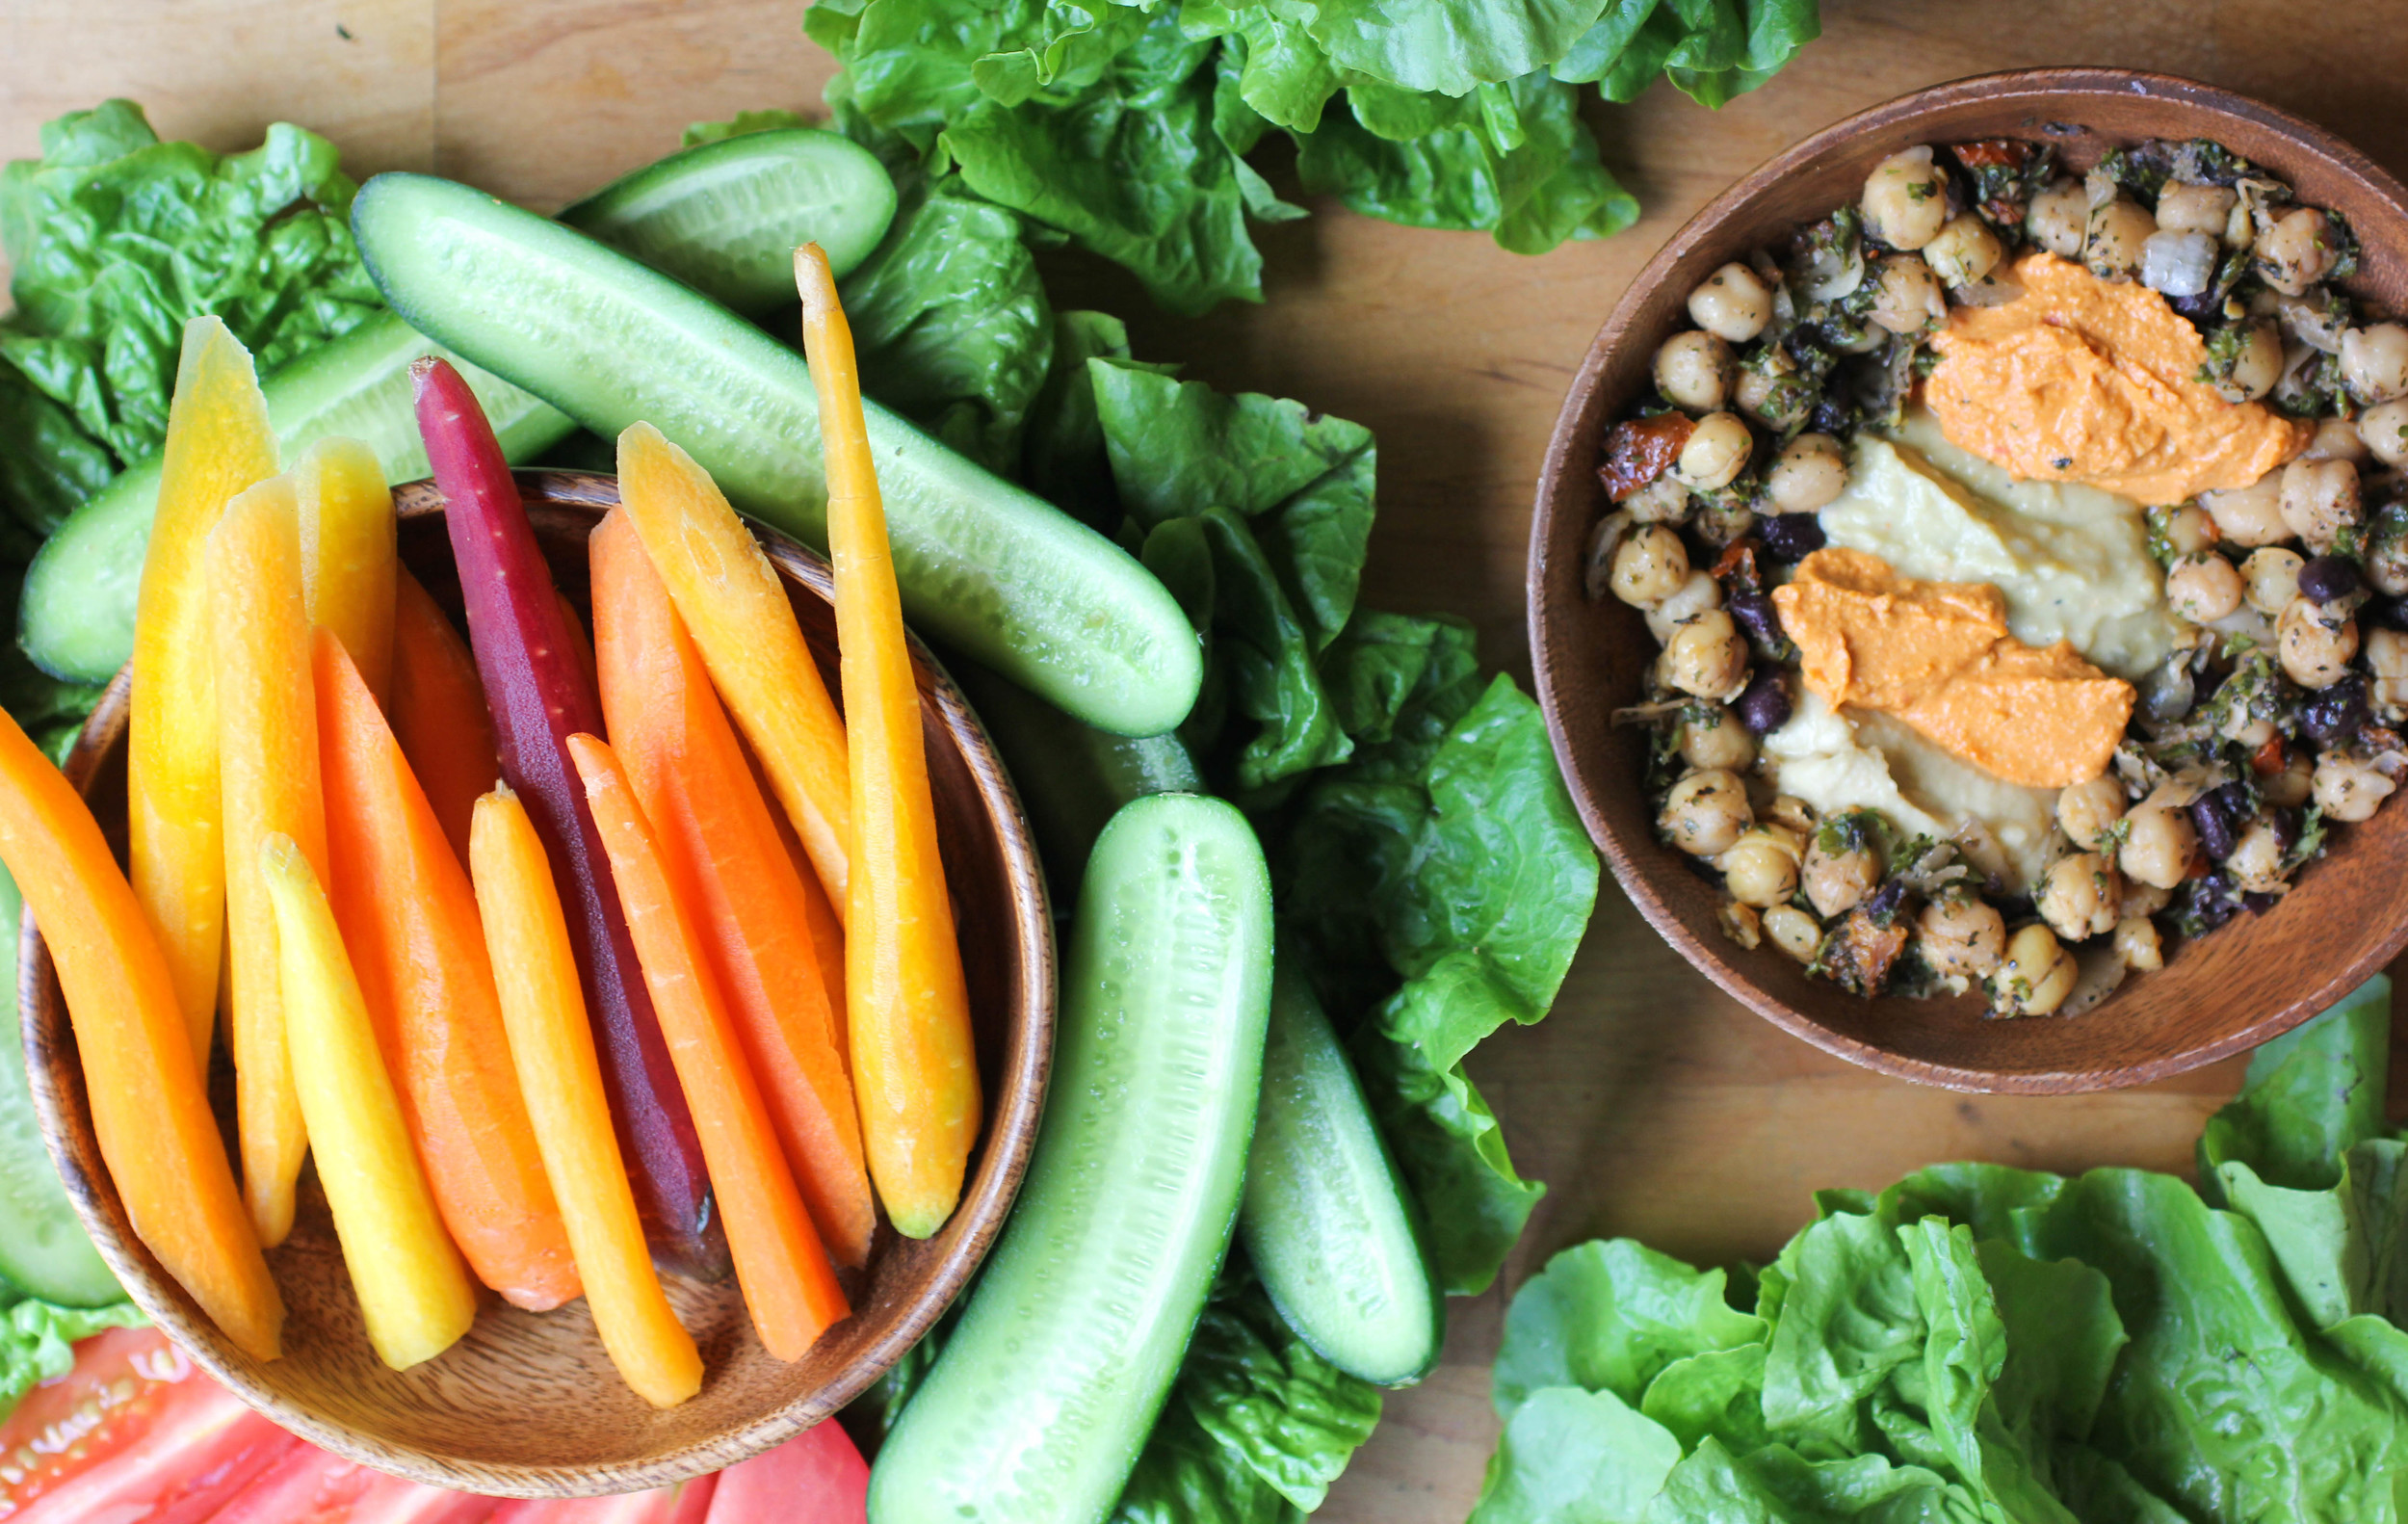 Vegetables,Legumes And Herbs In Season